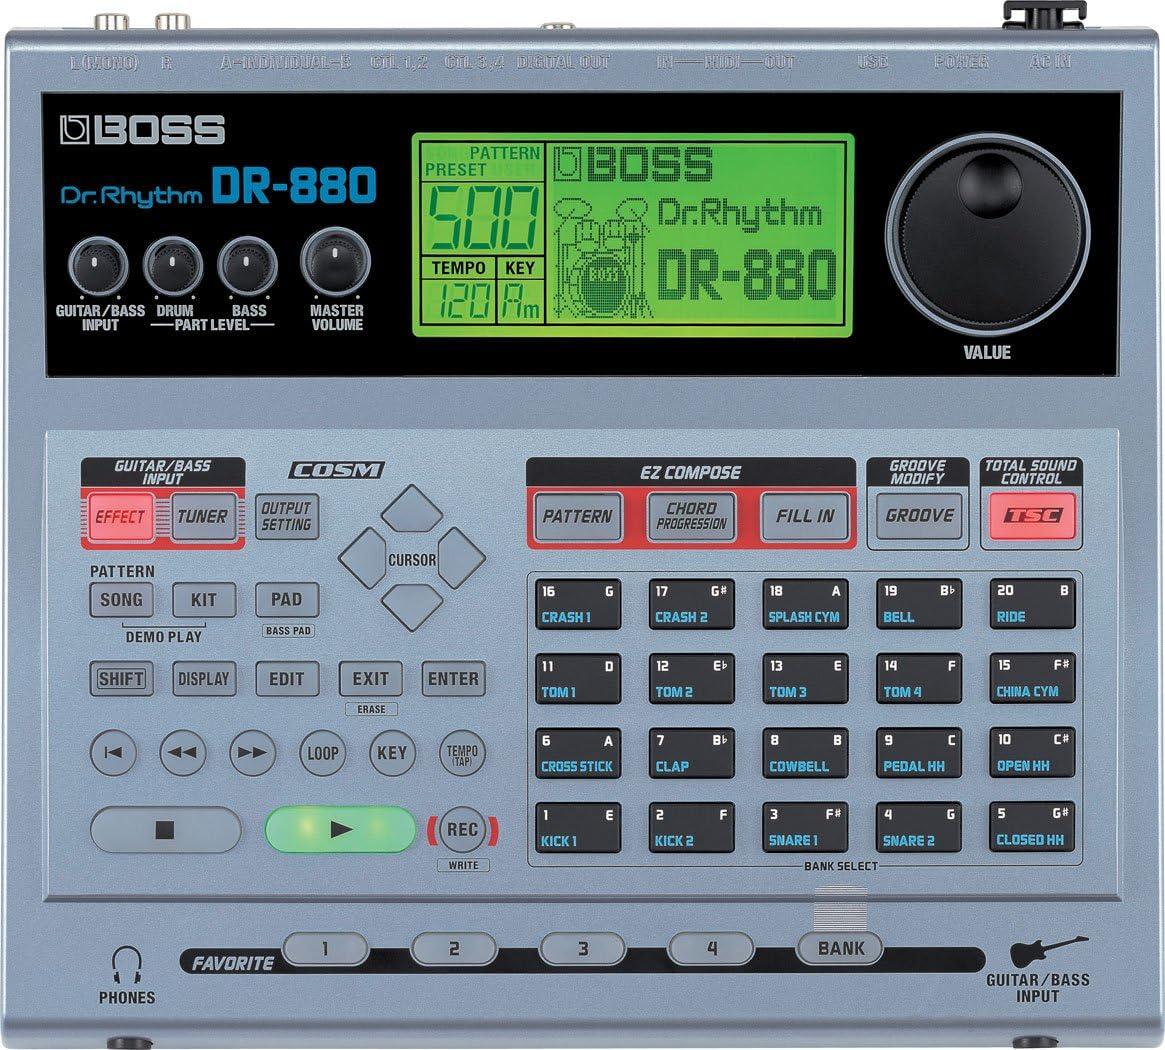 BOSS Máquina DR-880 Dr. Rhythm Drum: Amazon.es: Instrumentos musicales